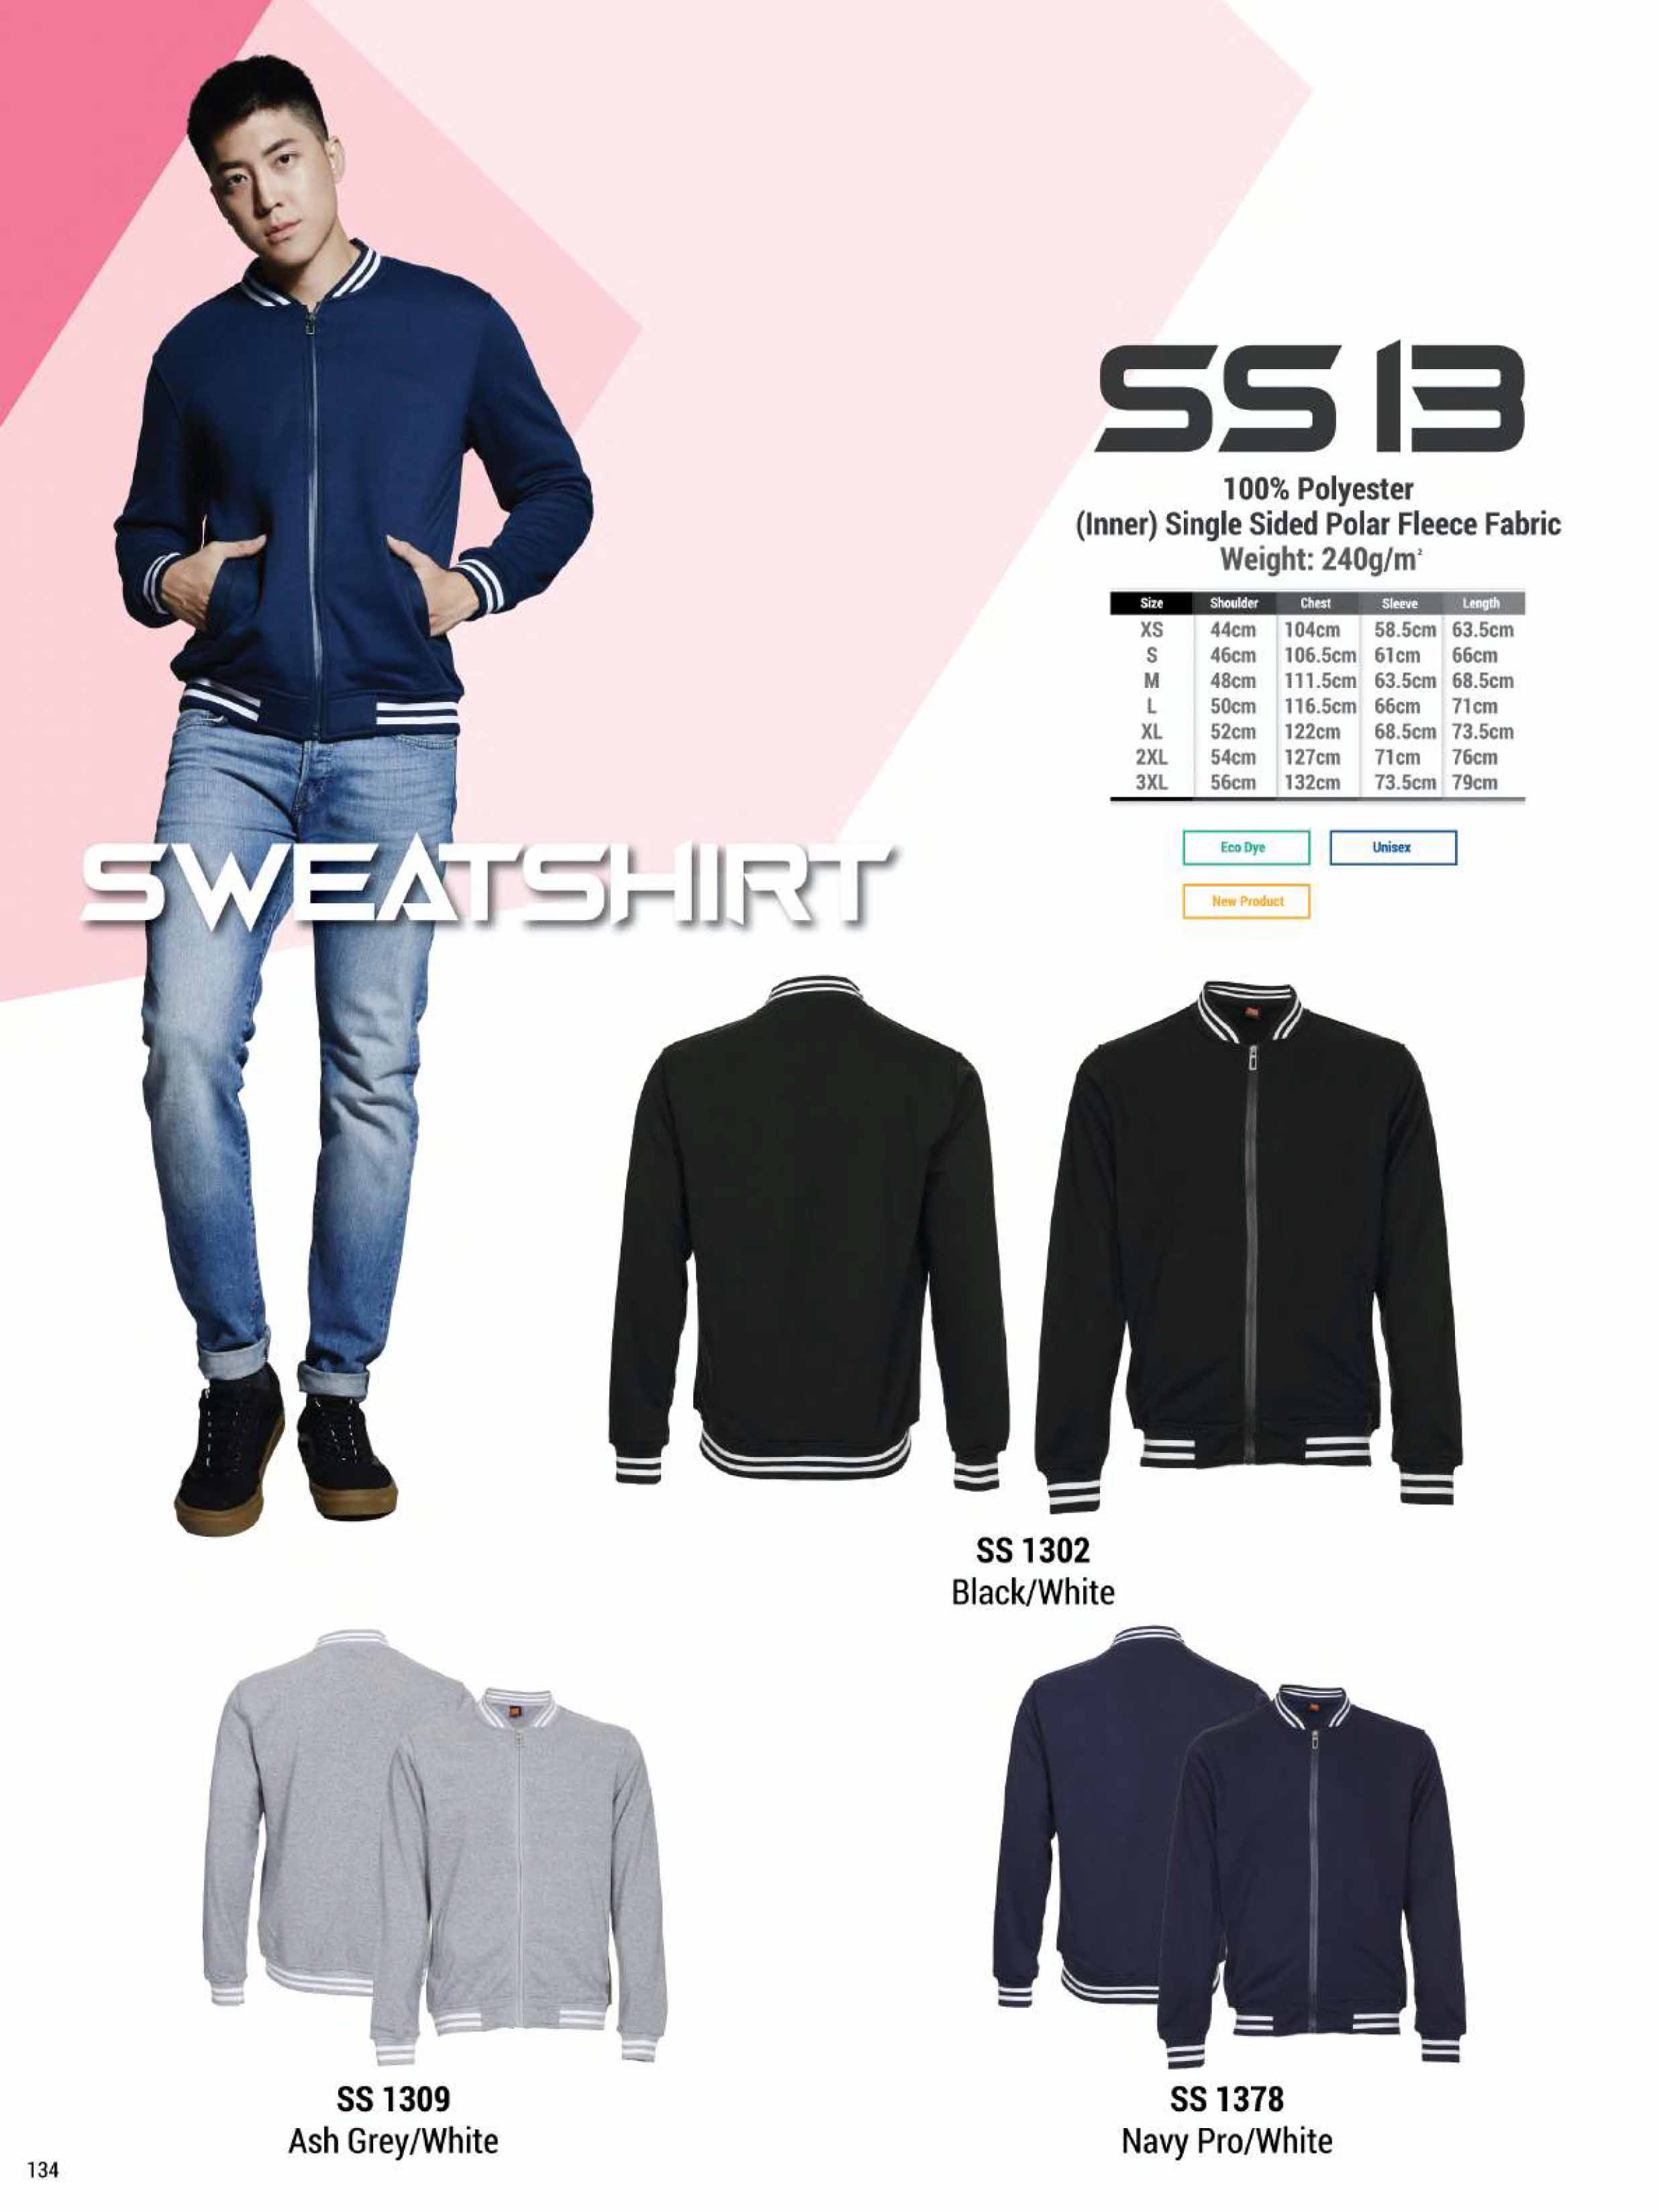 SS13 SWEATSHIRT